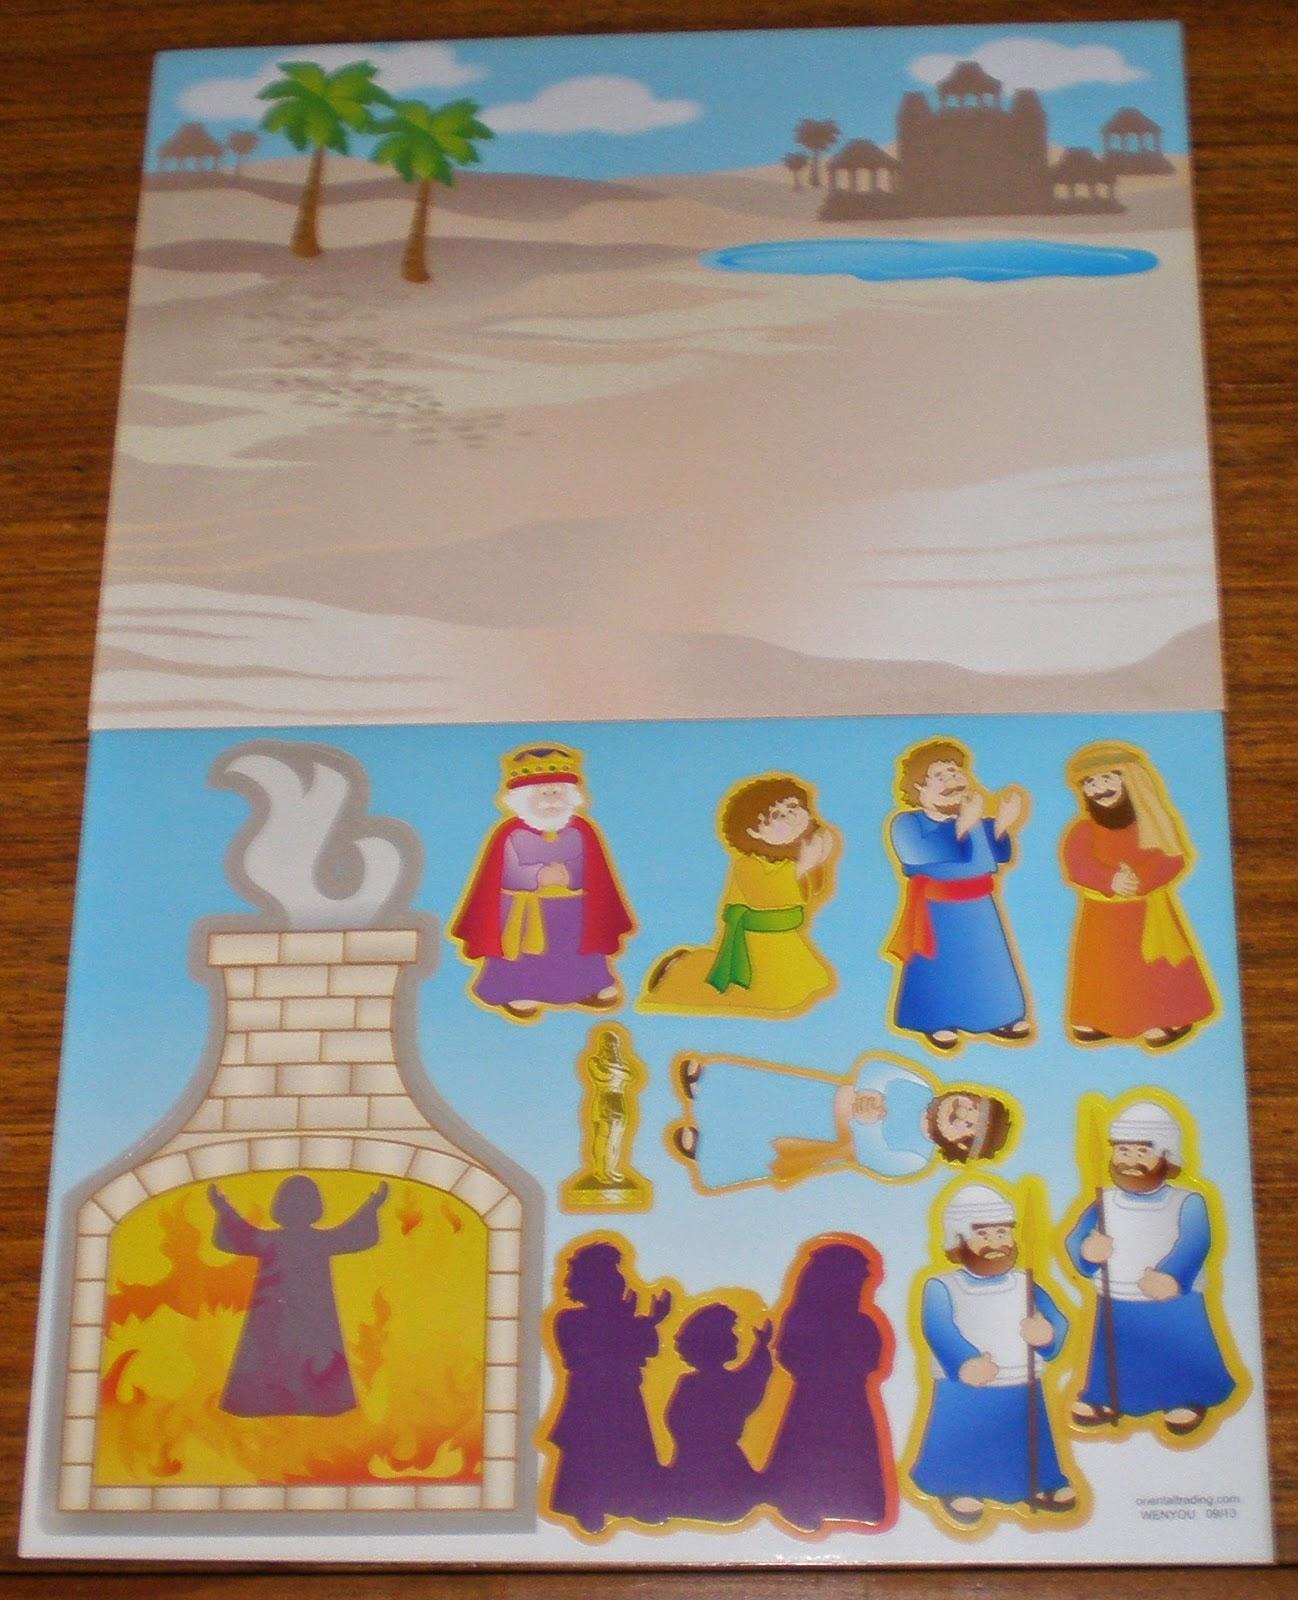 petersham bible book u0026 tract depot shadrach meshach u0026 abednego